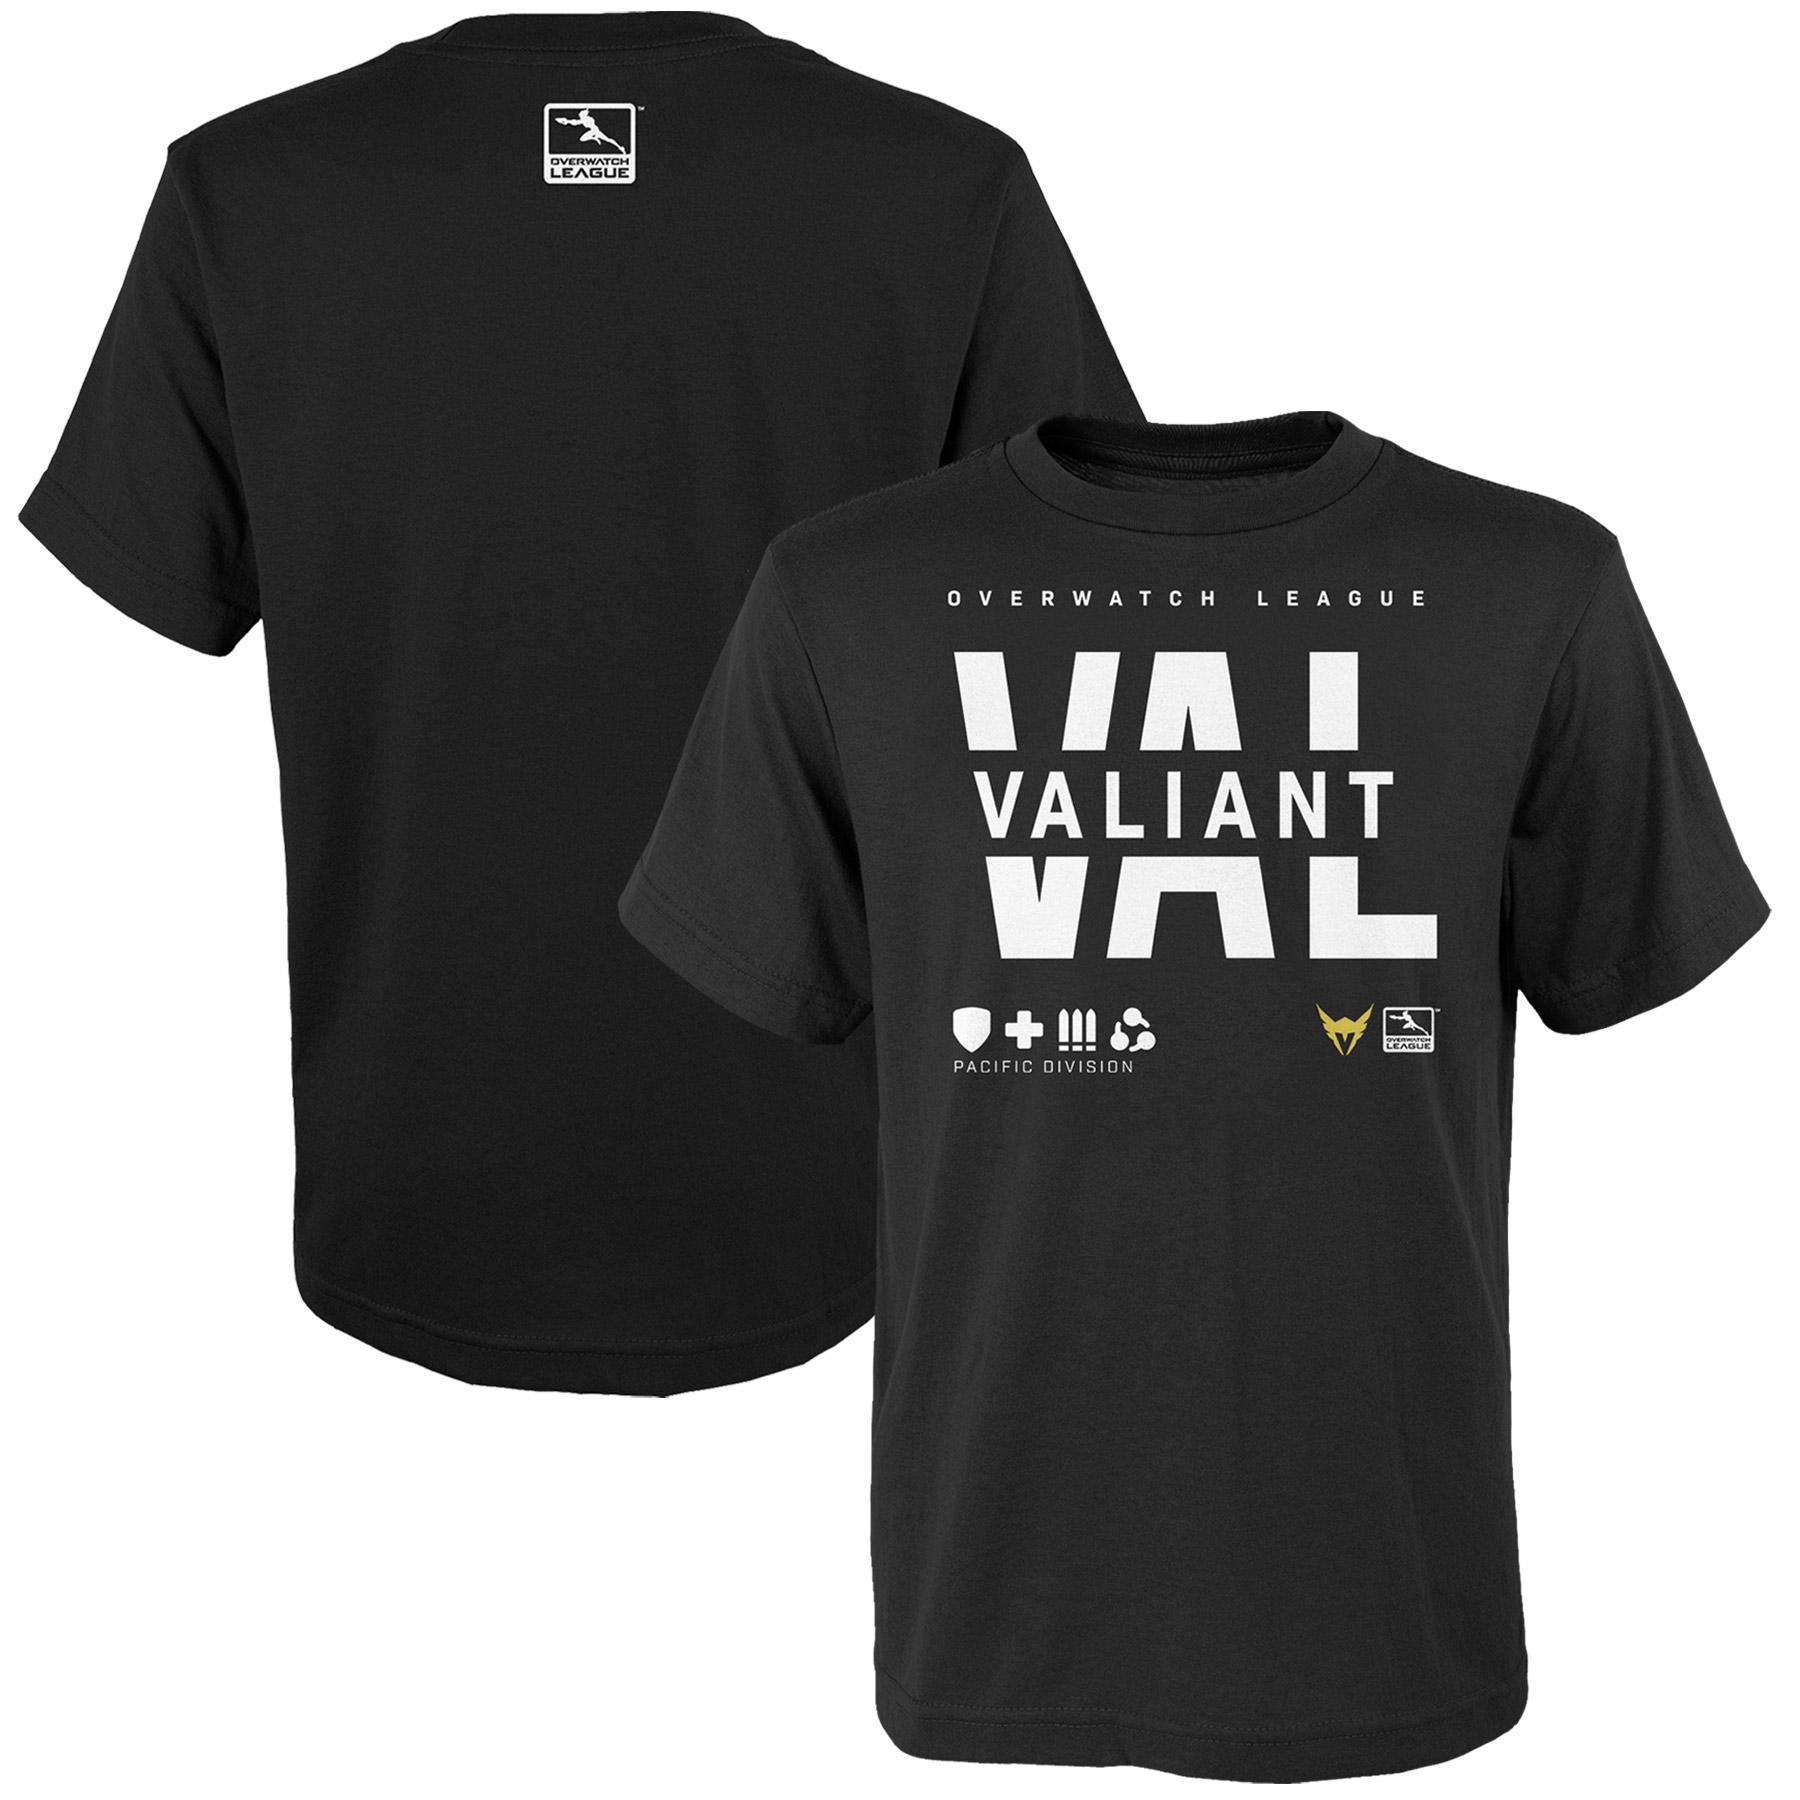 Los Angeles Valiant Youth Overwatch League Splitter T-Shirt - Black